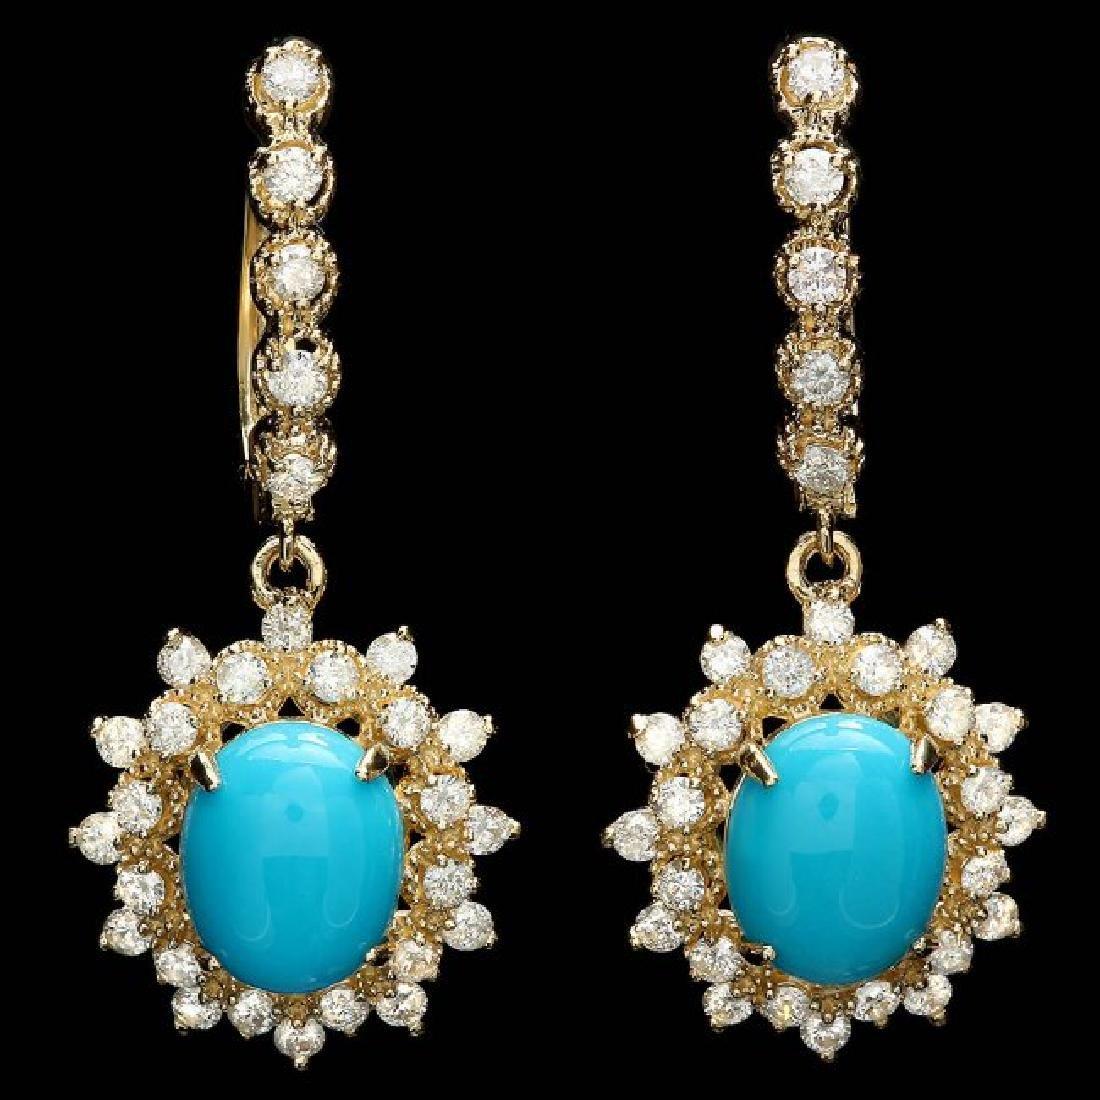 14k Gold 4.00ct Turquoise 1.65ct Diamond Earrings